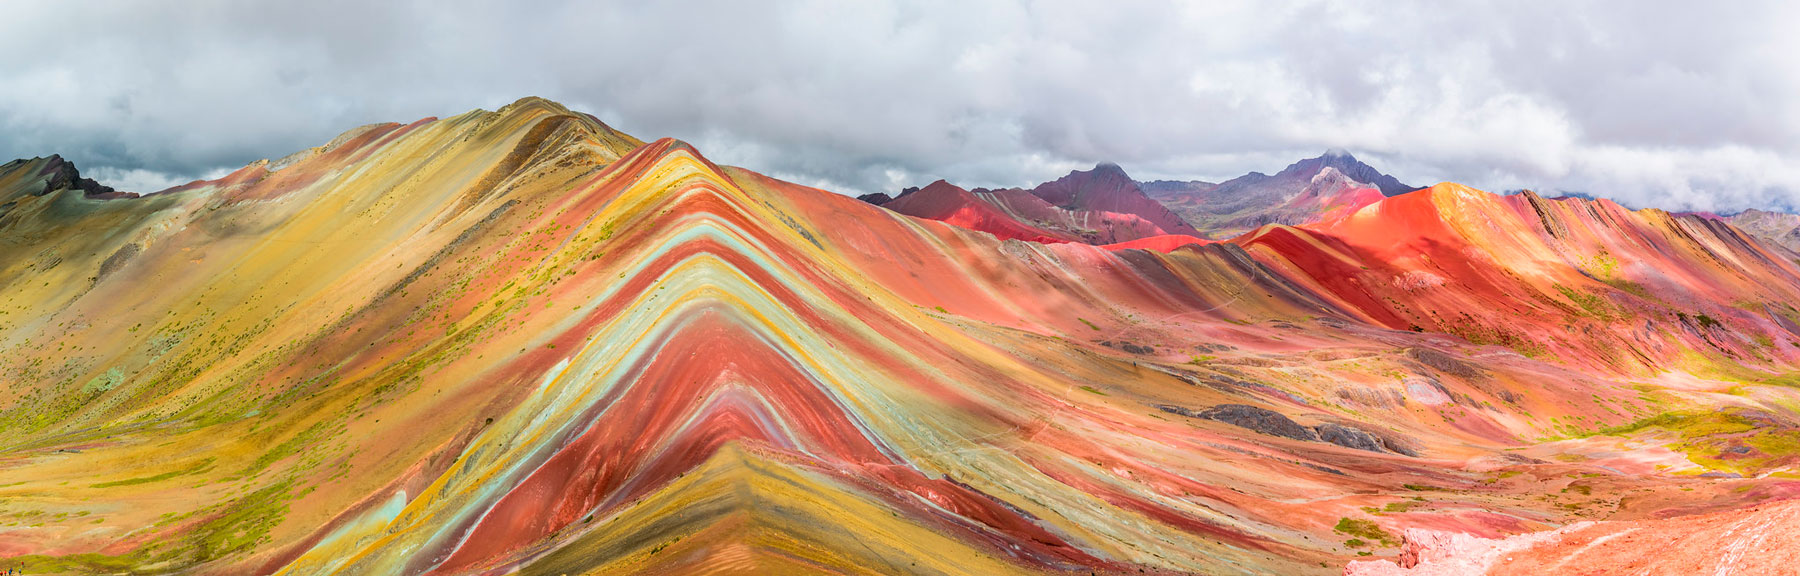 Tour a Machu Picchu y Montaña de Colores 2 dias